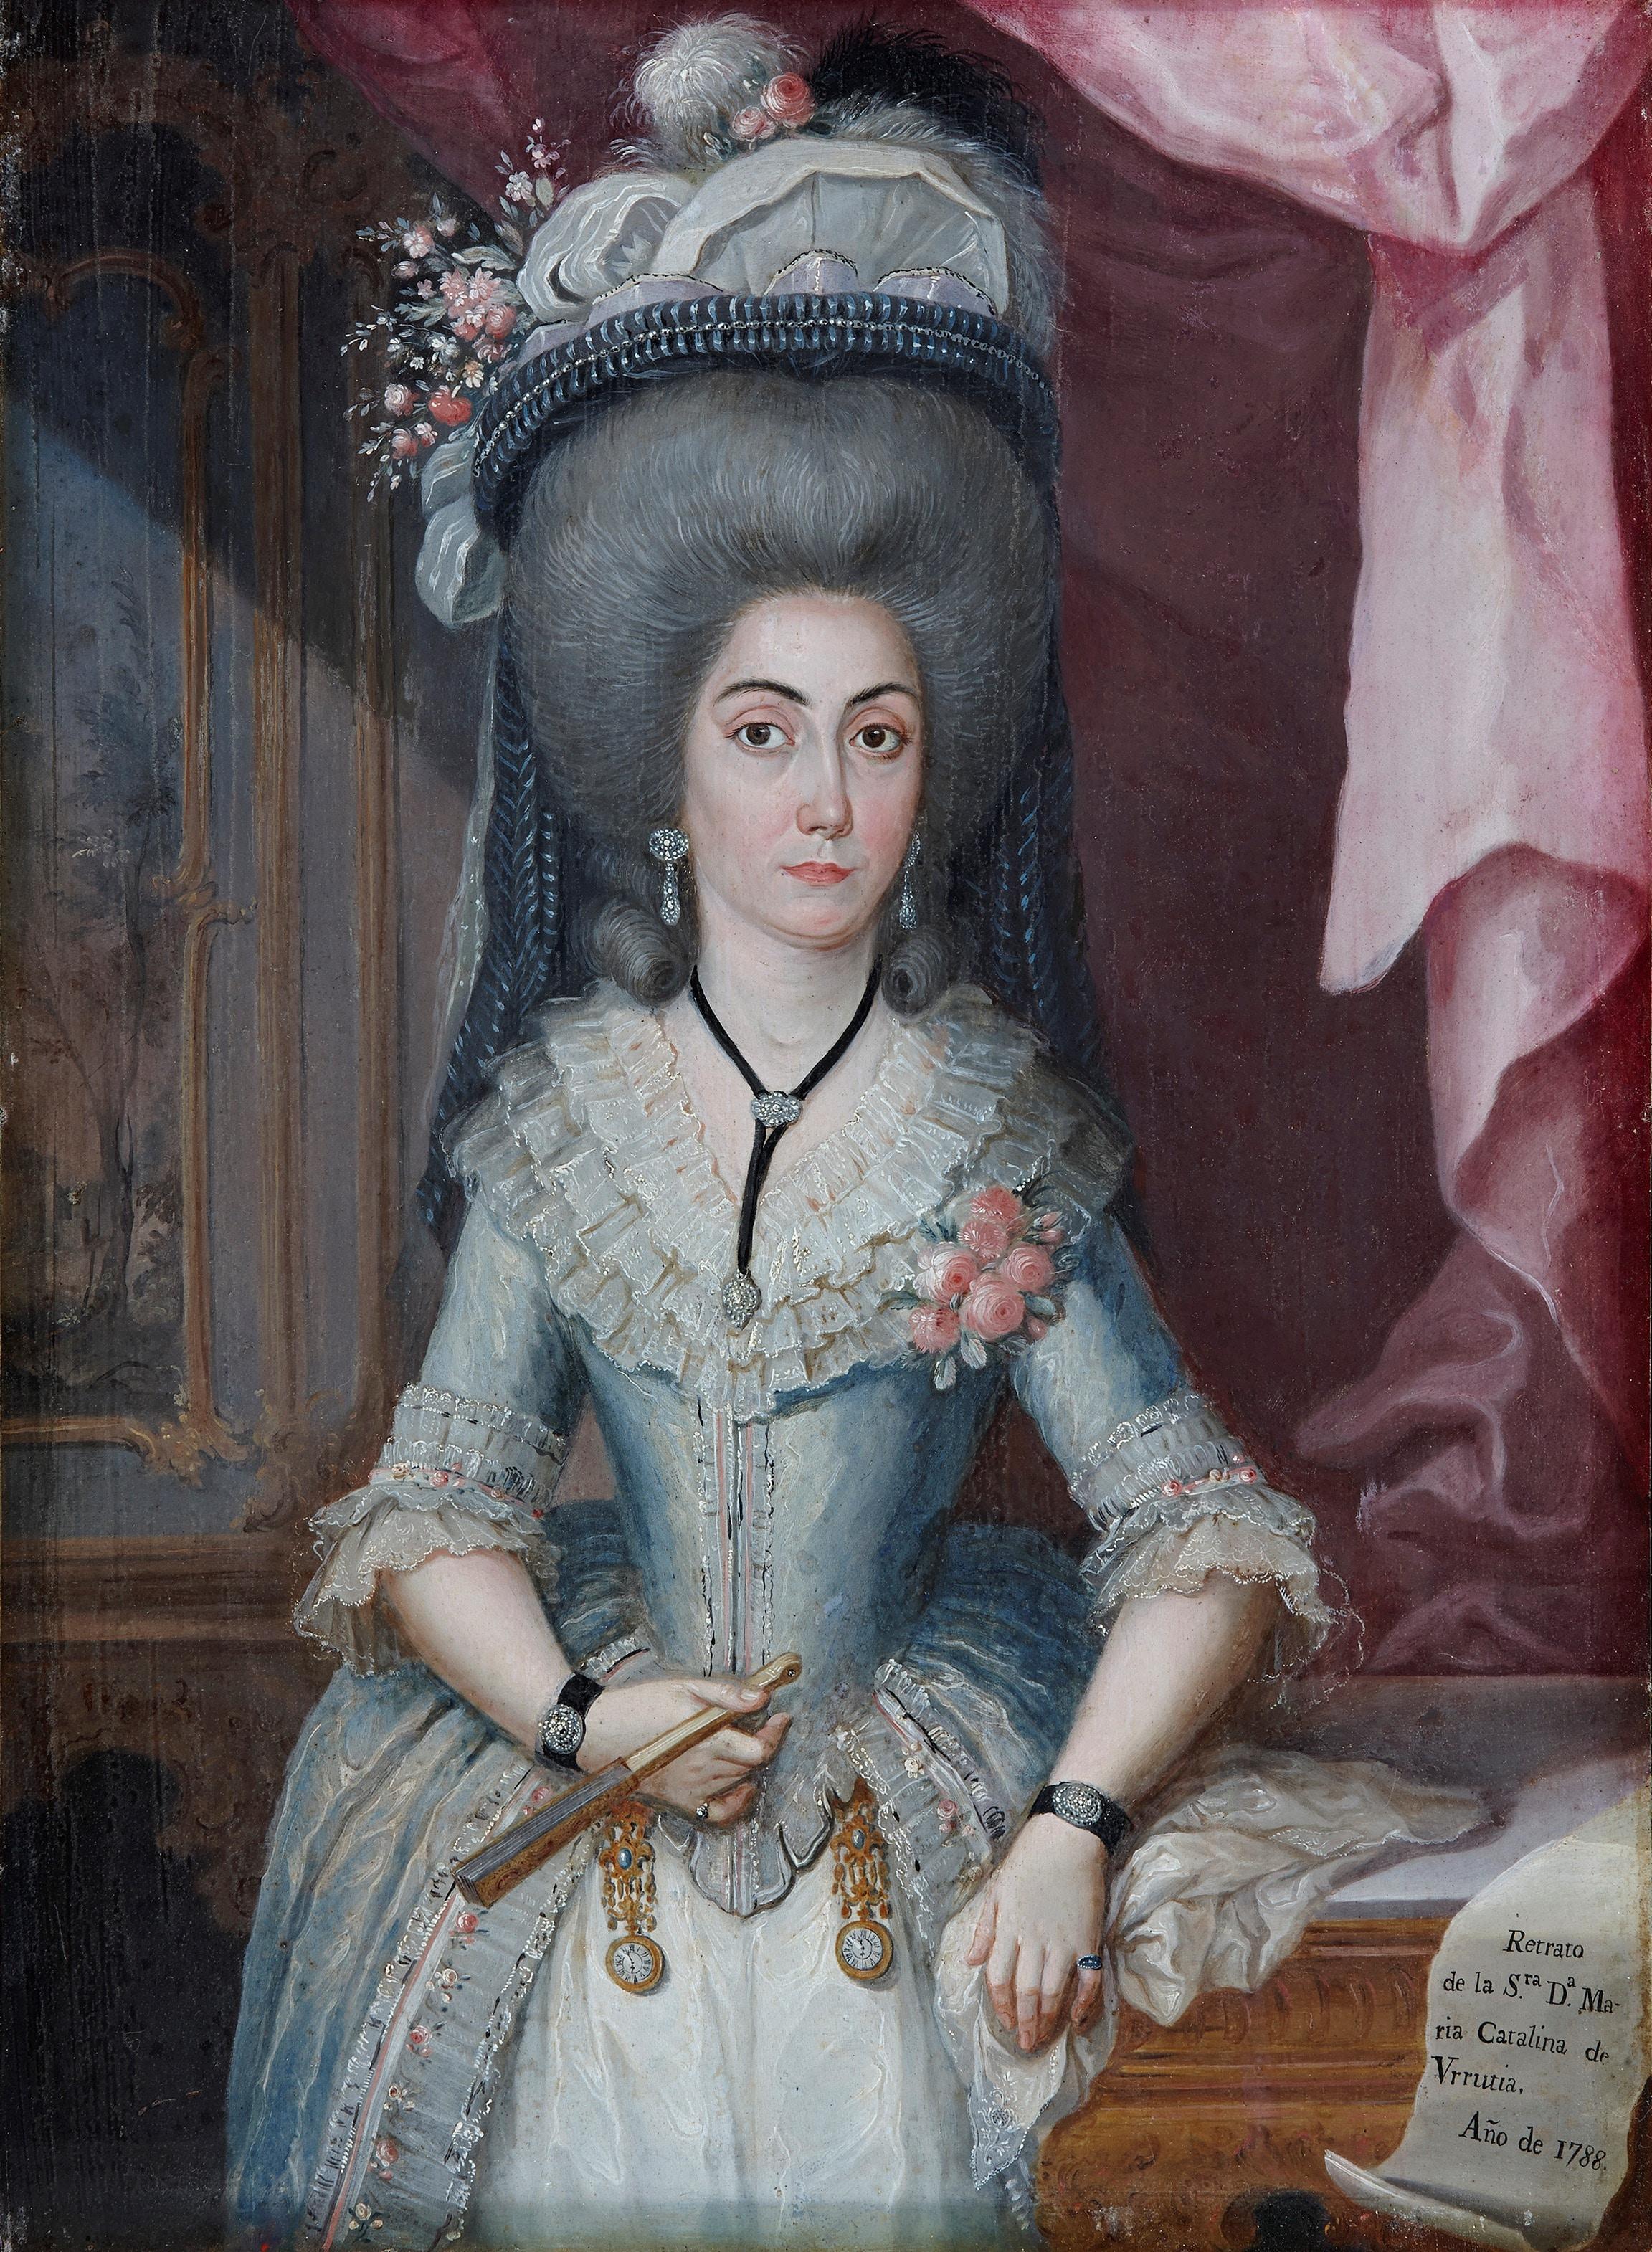 Portrait of doña María Catalina de Urrutia - José Campeche Jordán